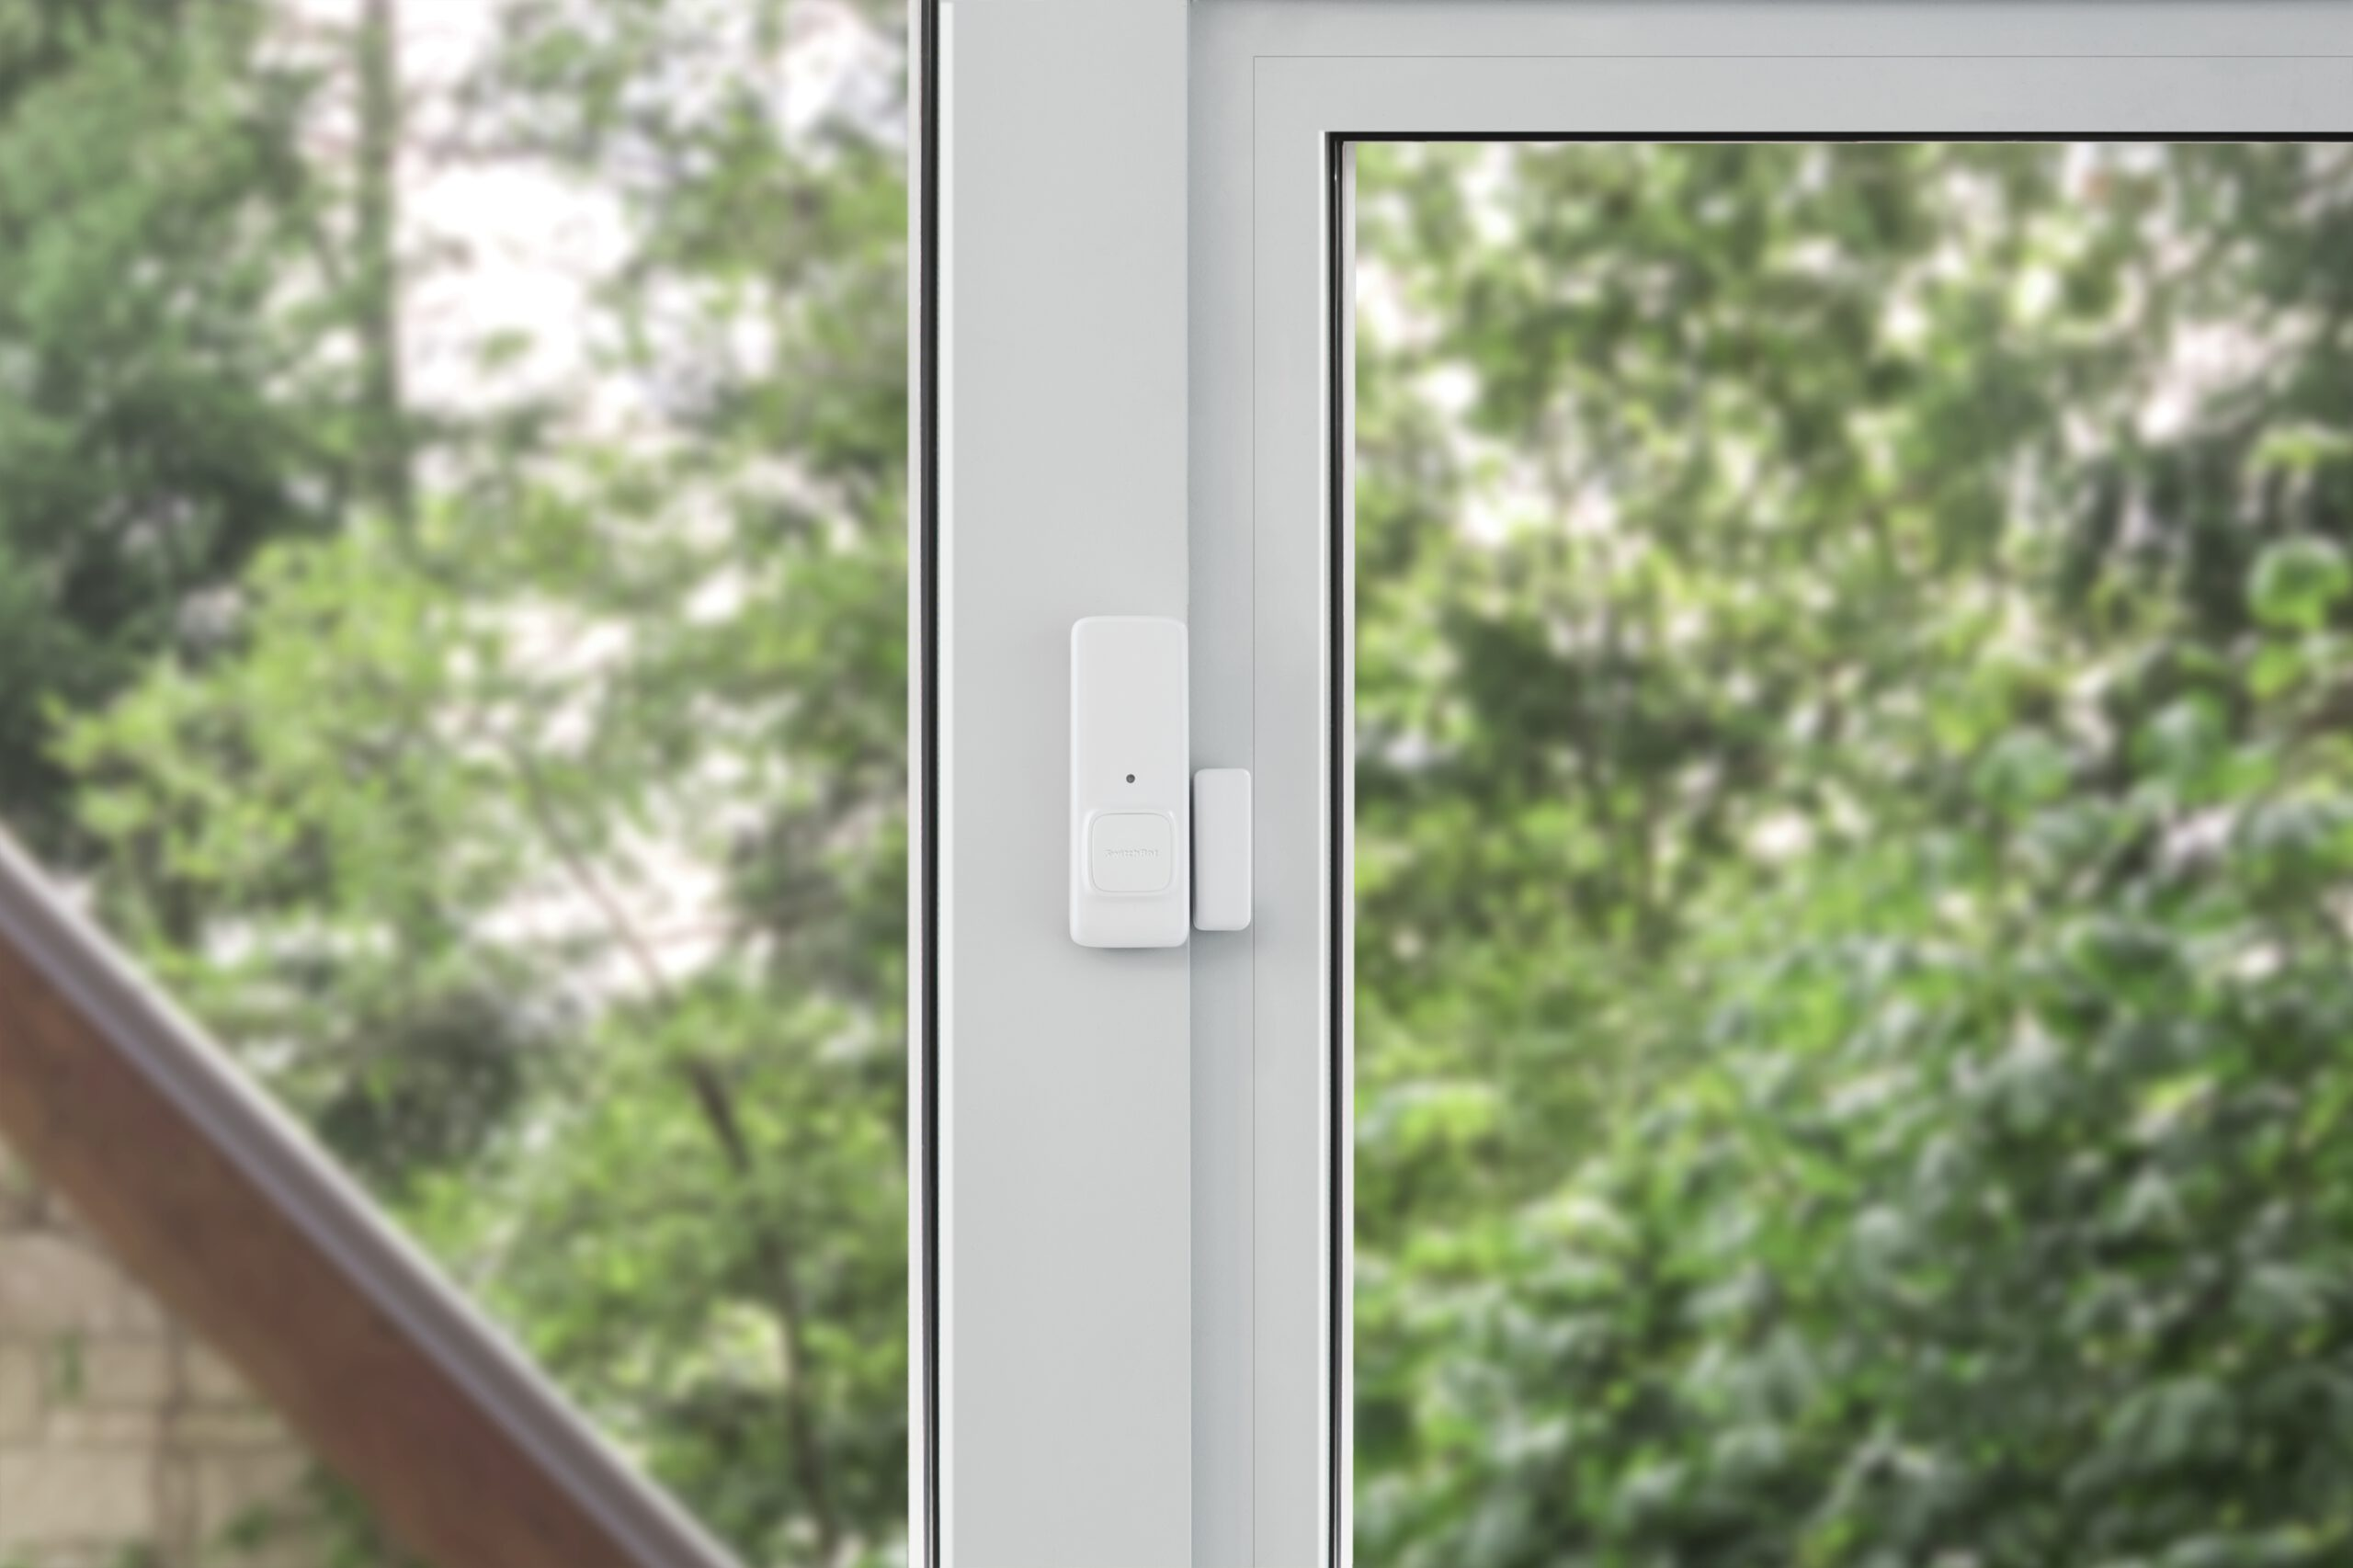 Befestigung des SwitchBot Kontaktsensor an einem Fensterrahmen.